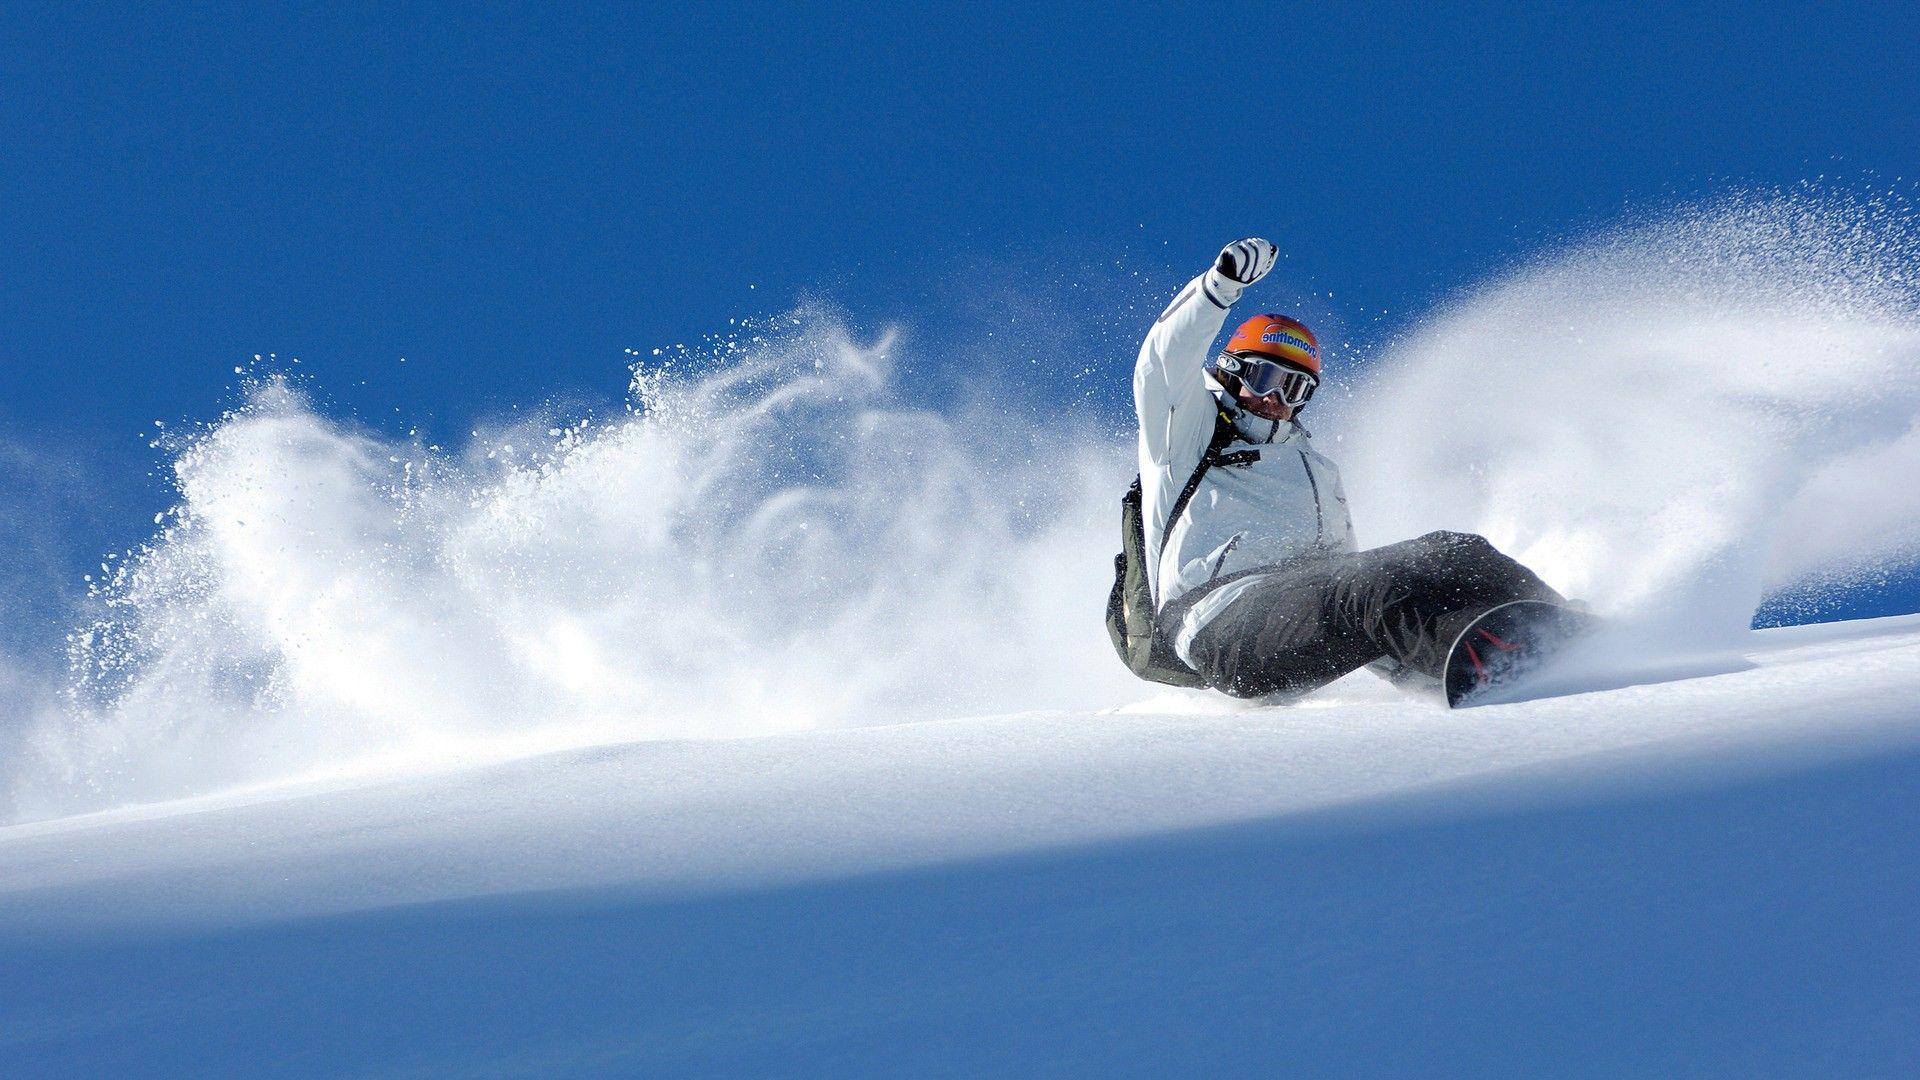 blue sky snowboarding image